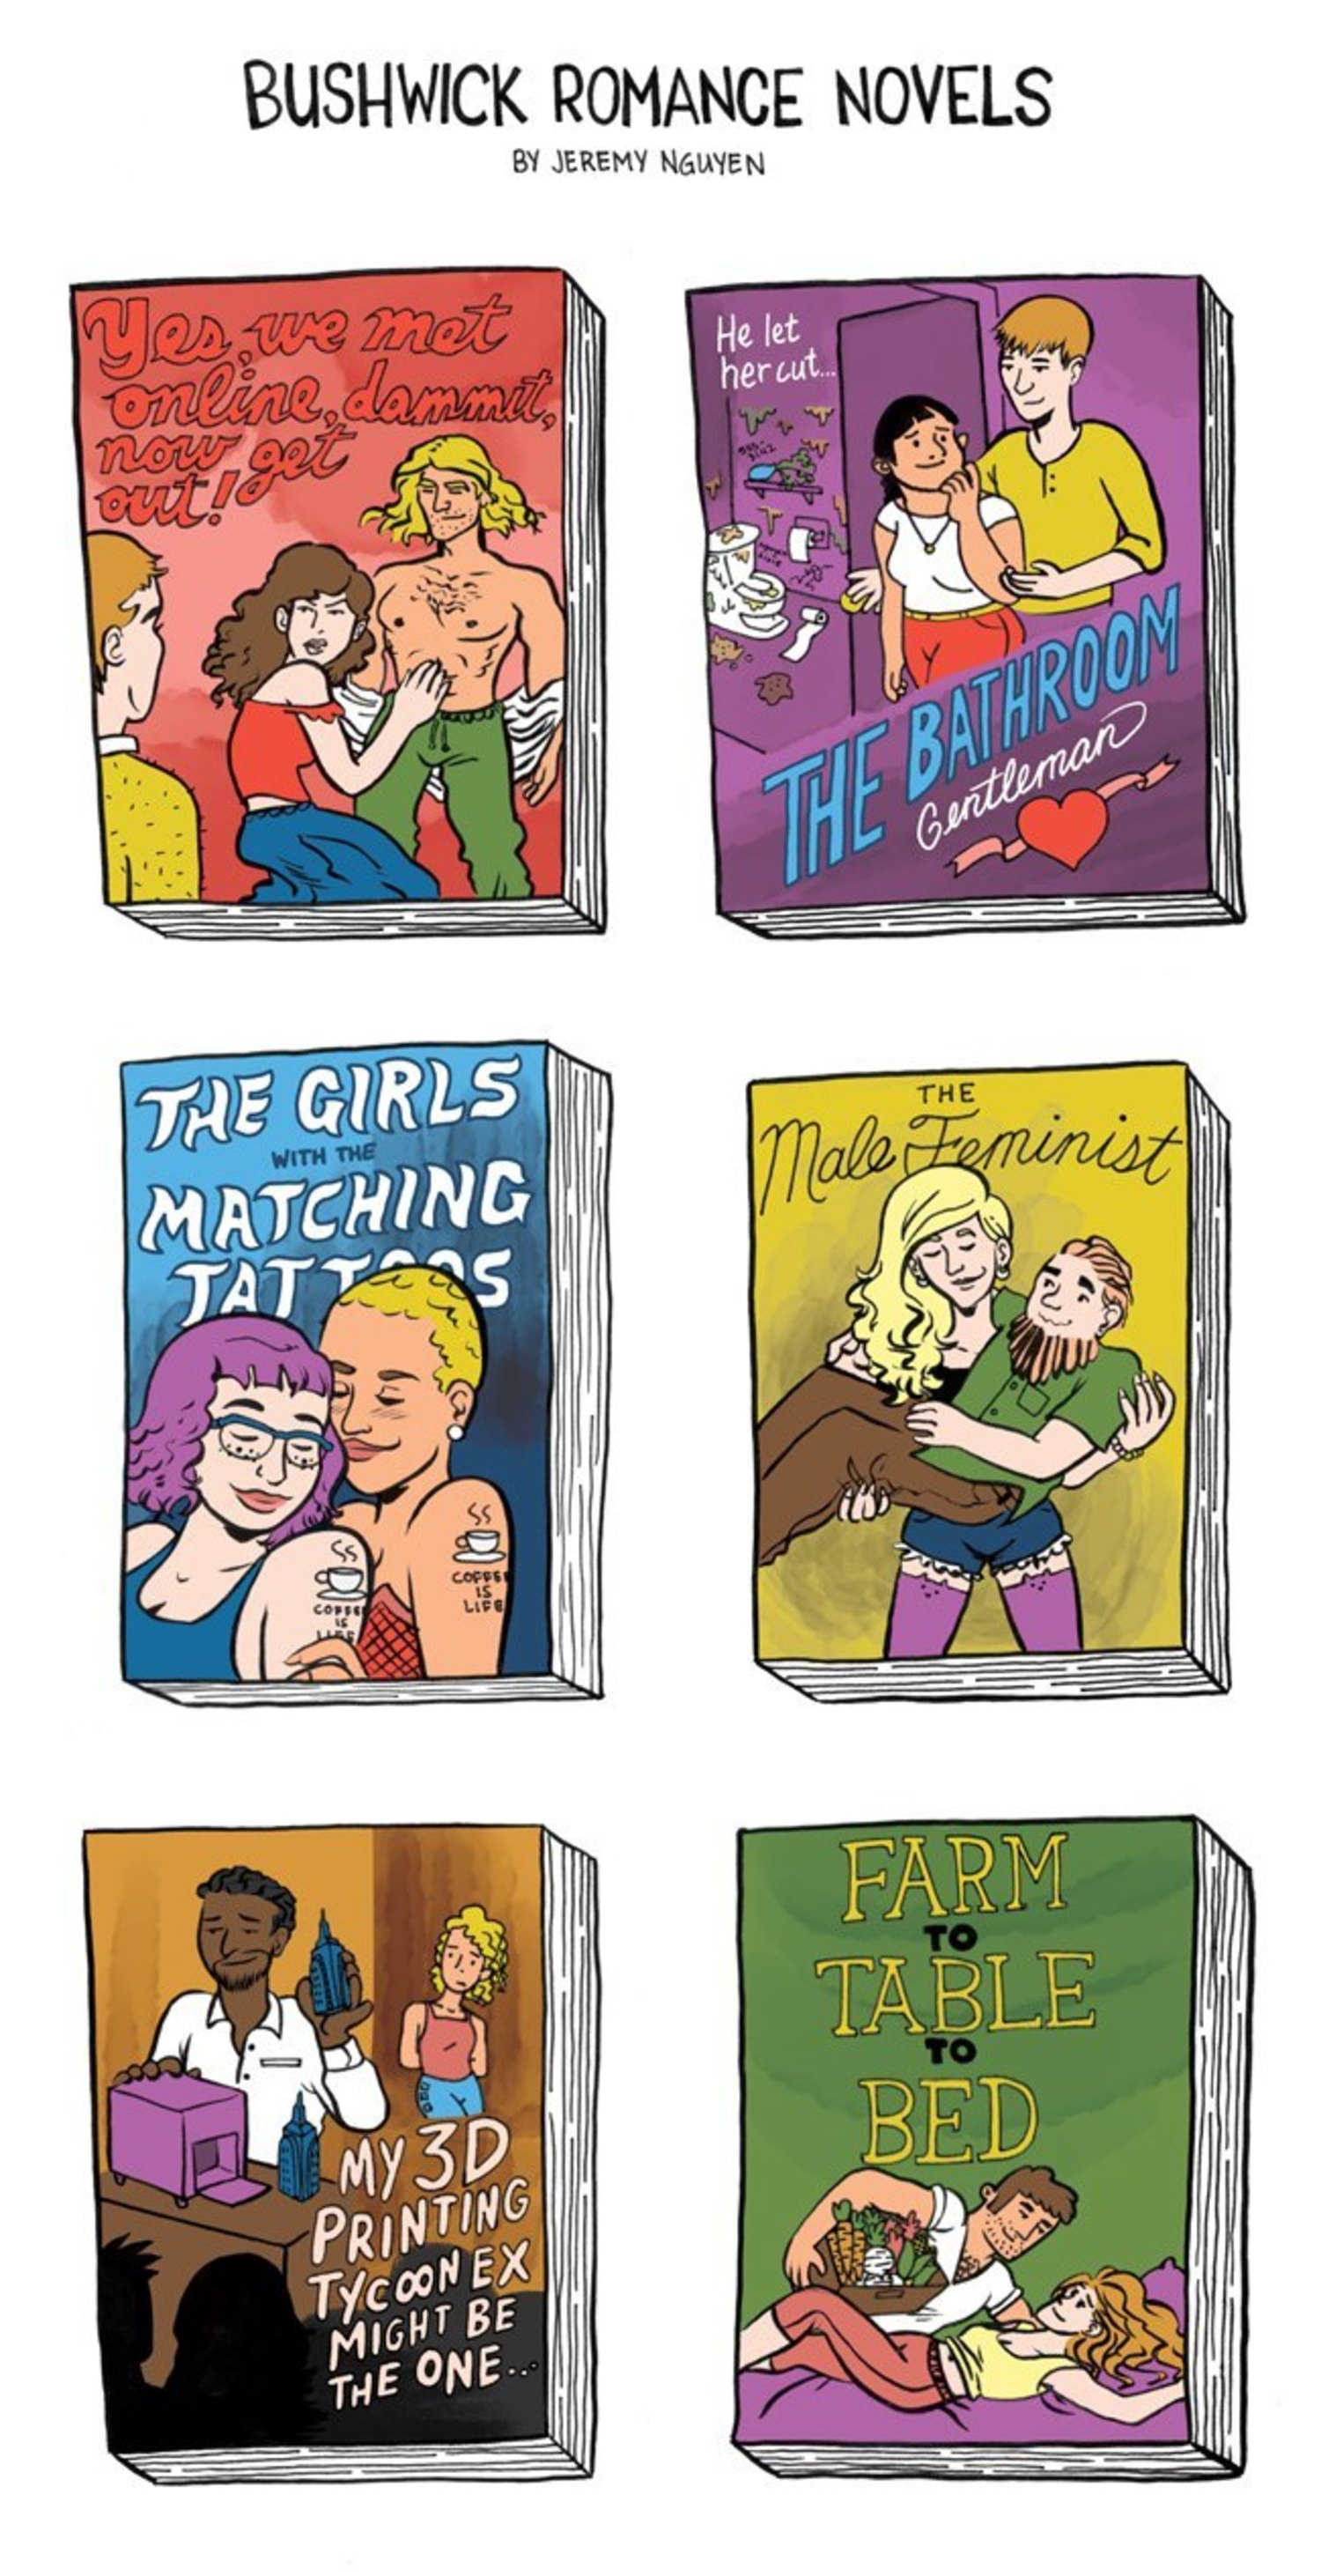 Bushwick Romance Novels